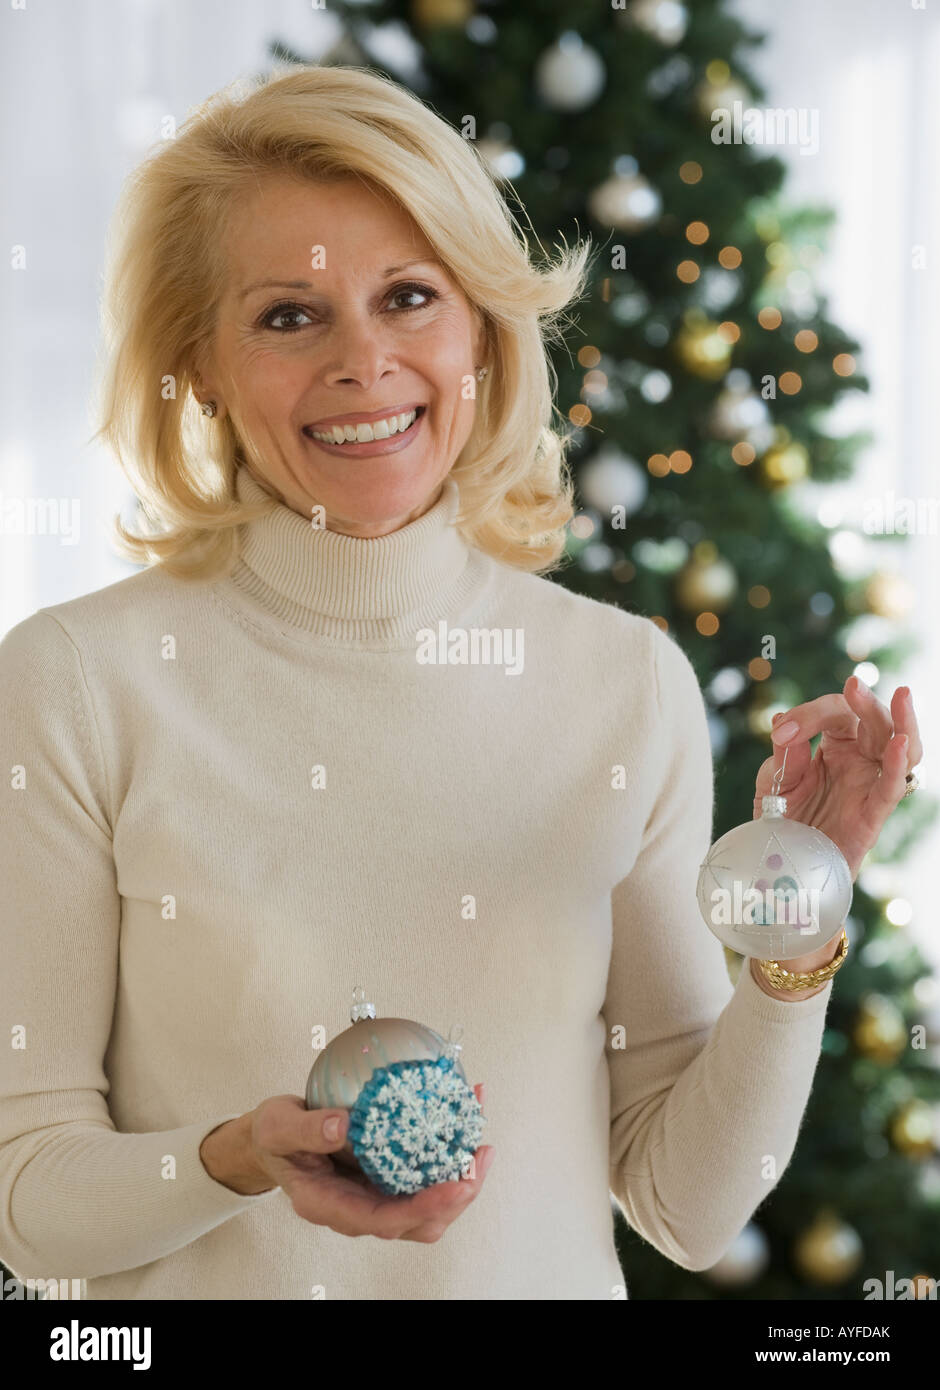 Senior woman holding Christmas ornaments - Stock Image